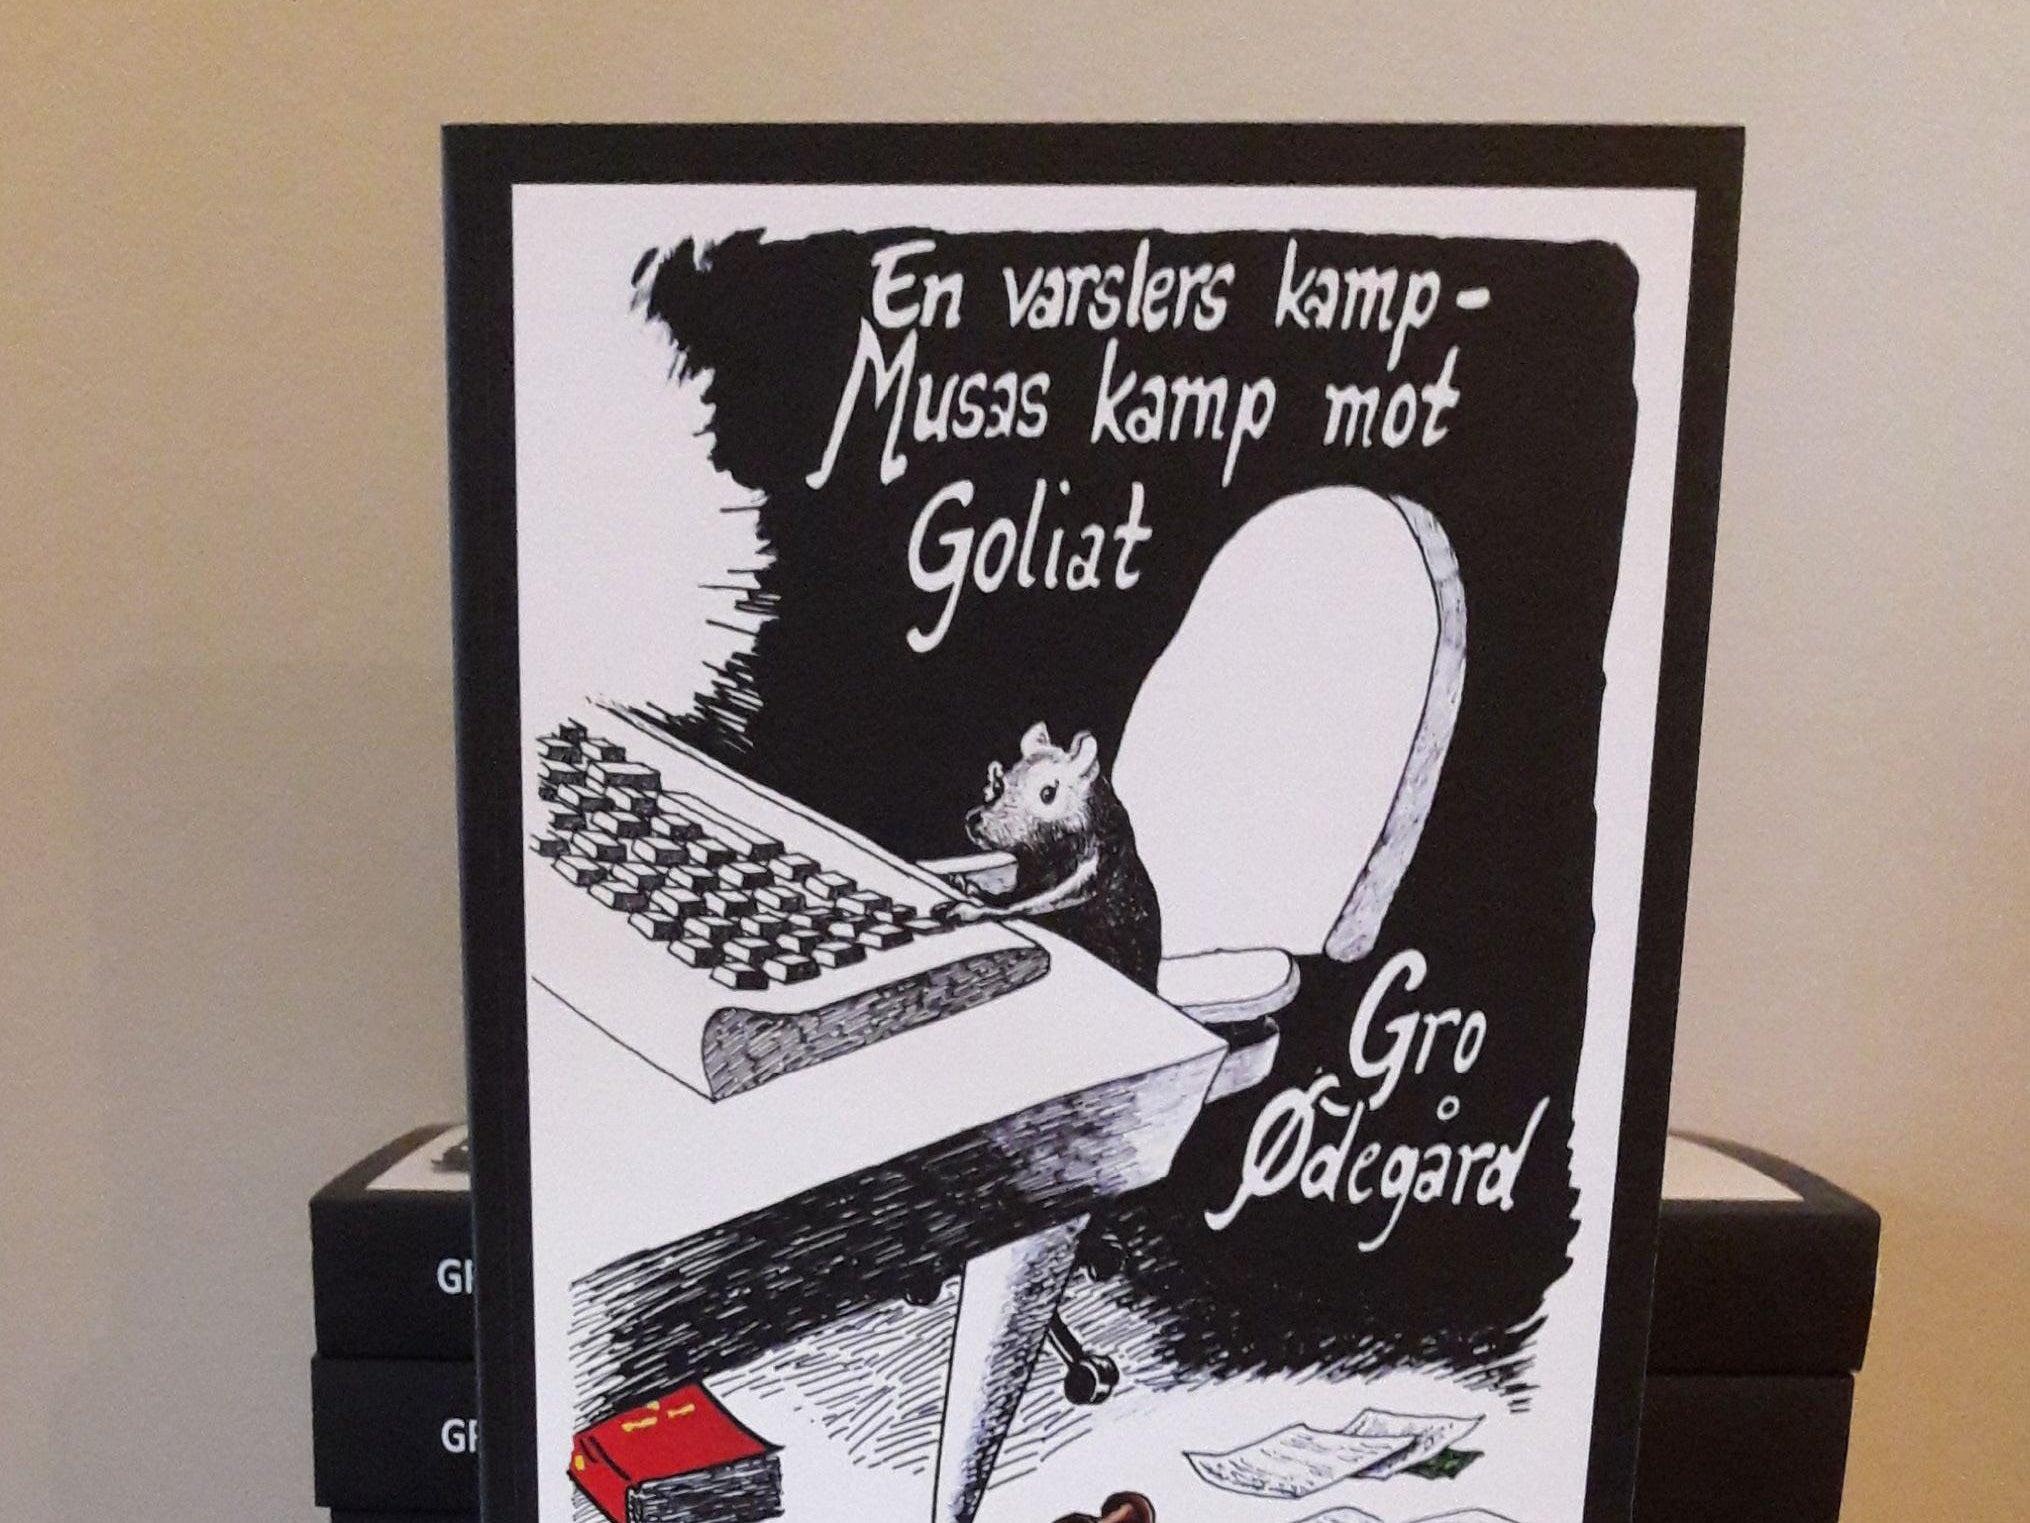 Page 12 of Dokumentar: EN VARSLERS KAMP - MUSAS KAMP MOT GOLIAT